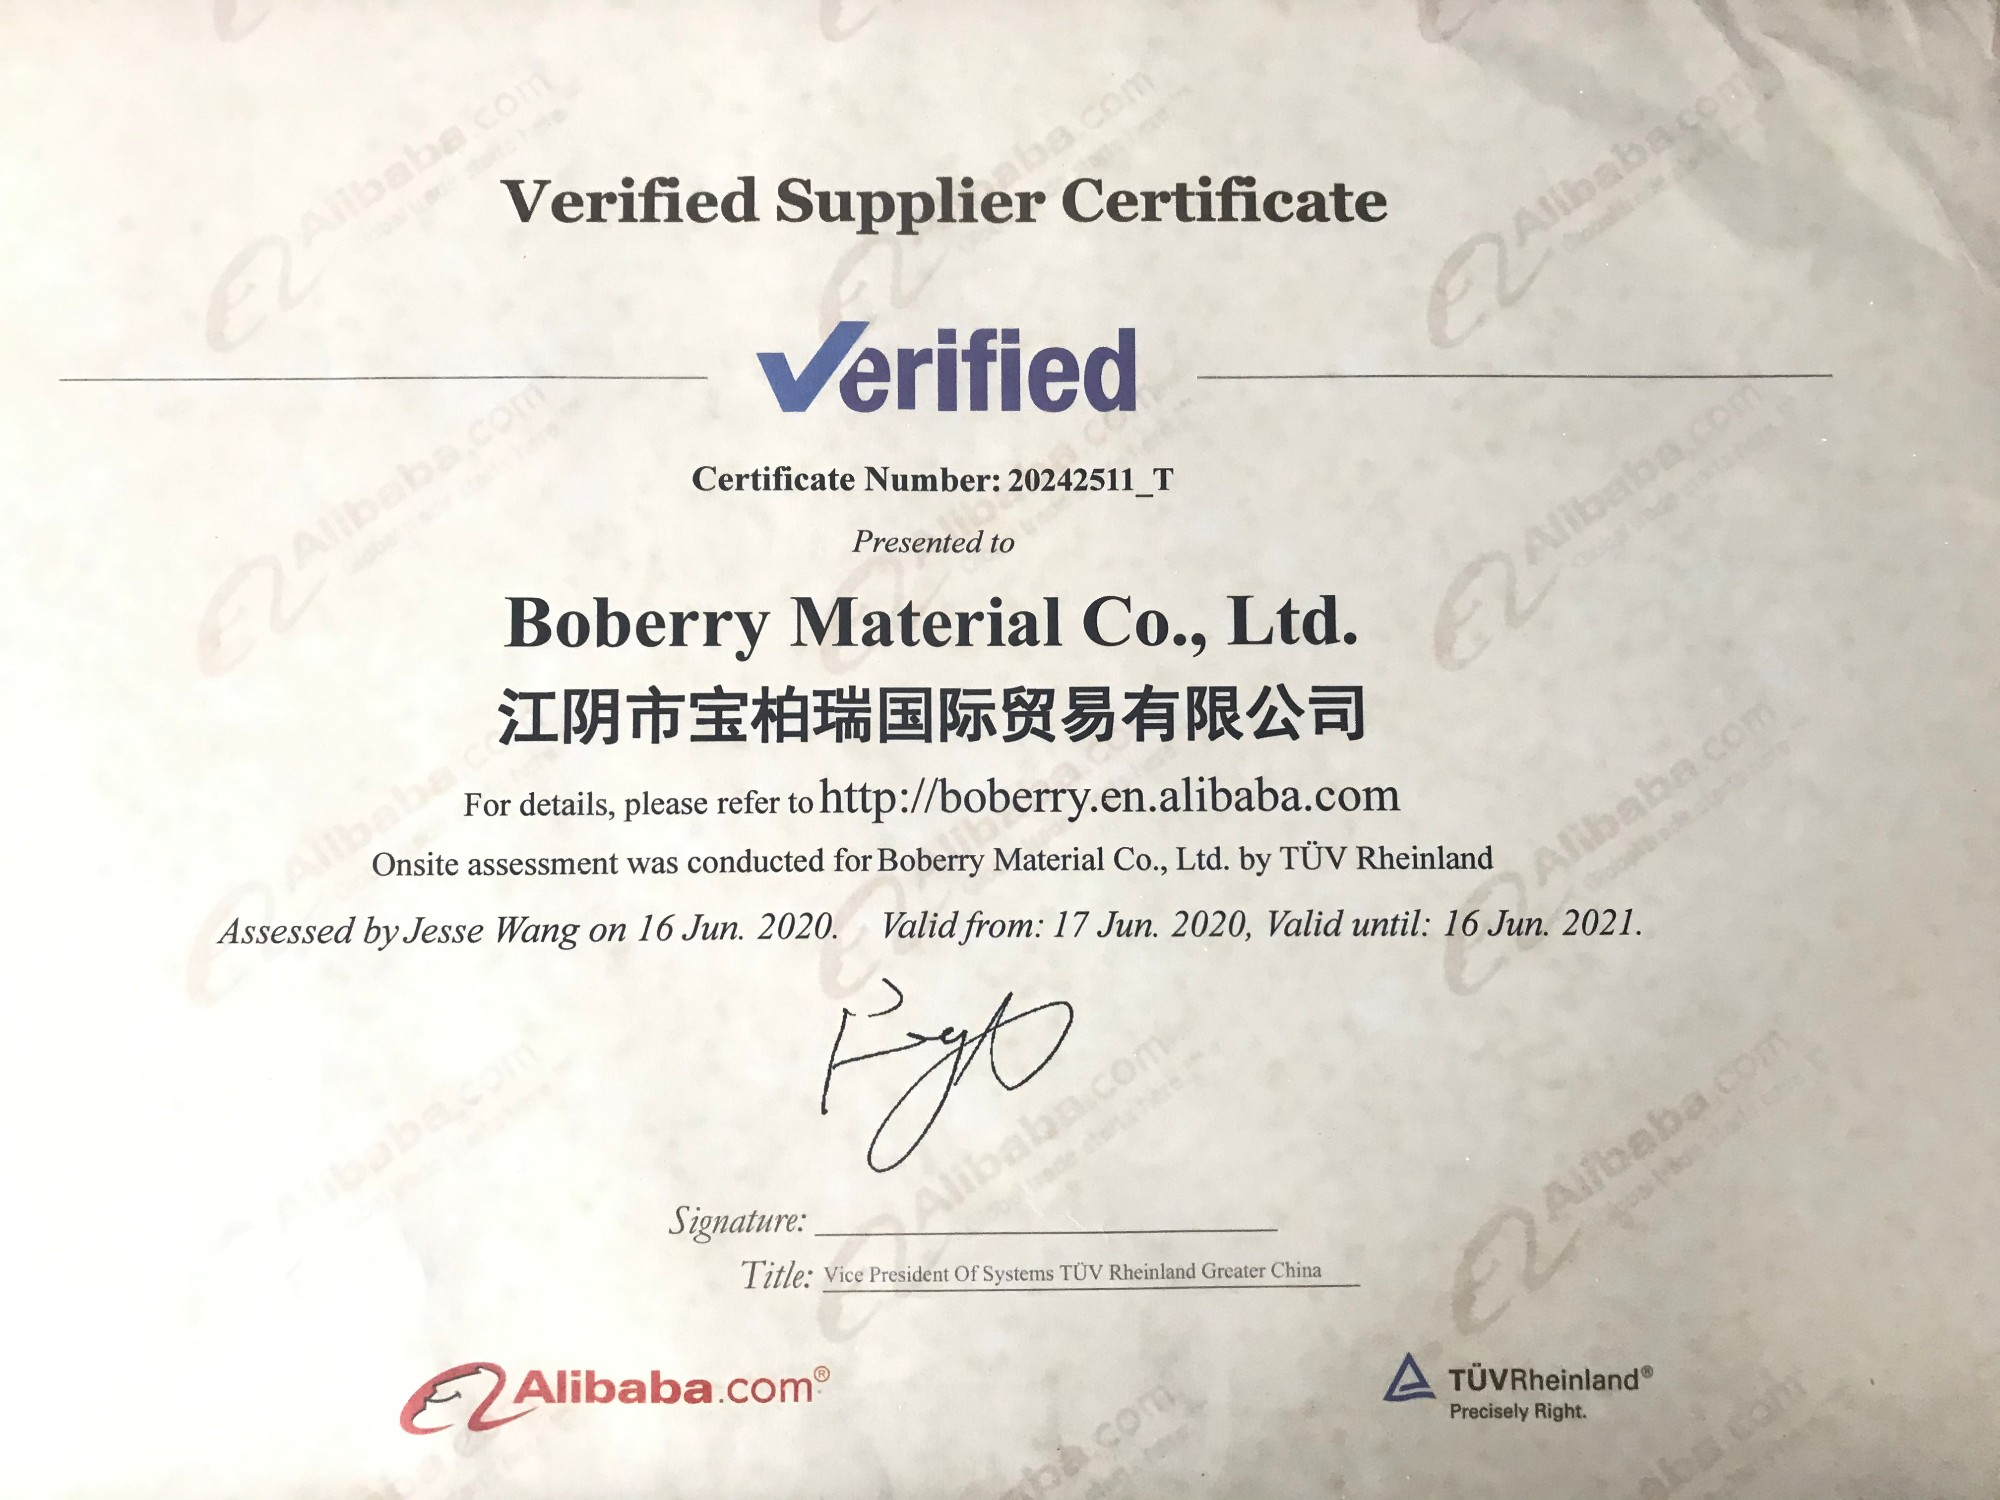 Verified supplier certificate 1